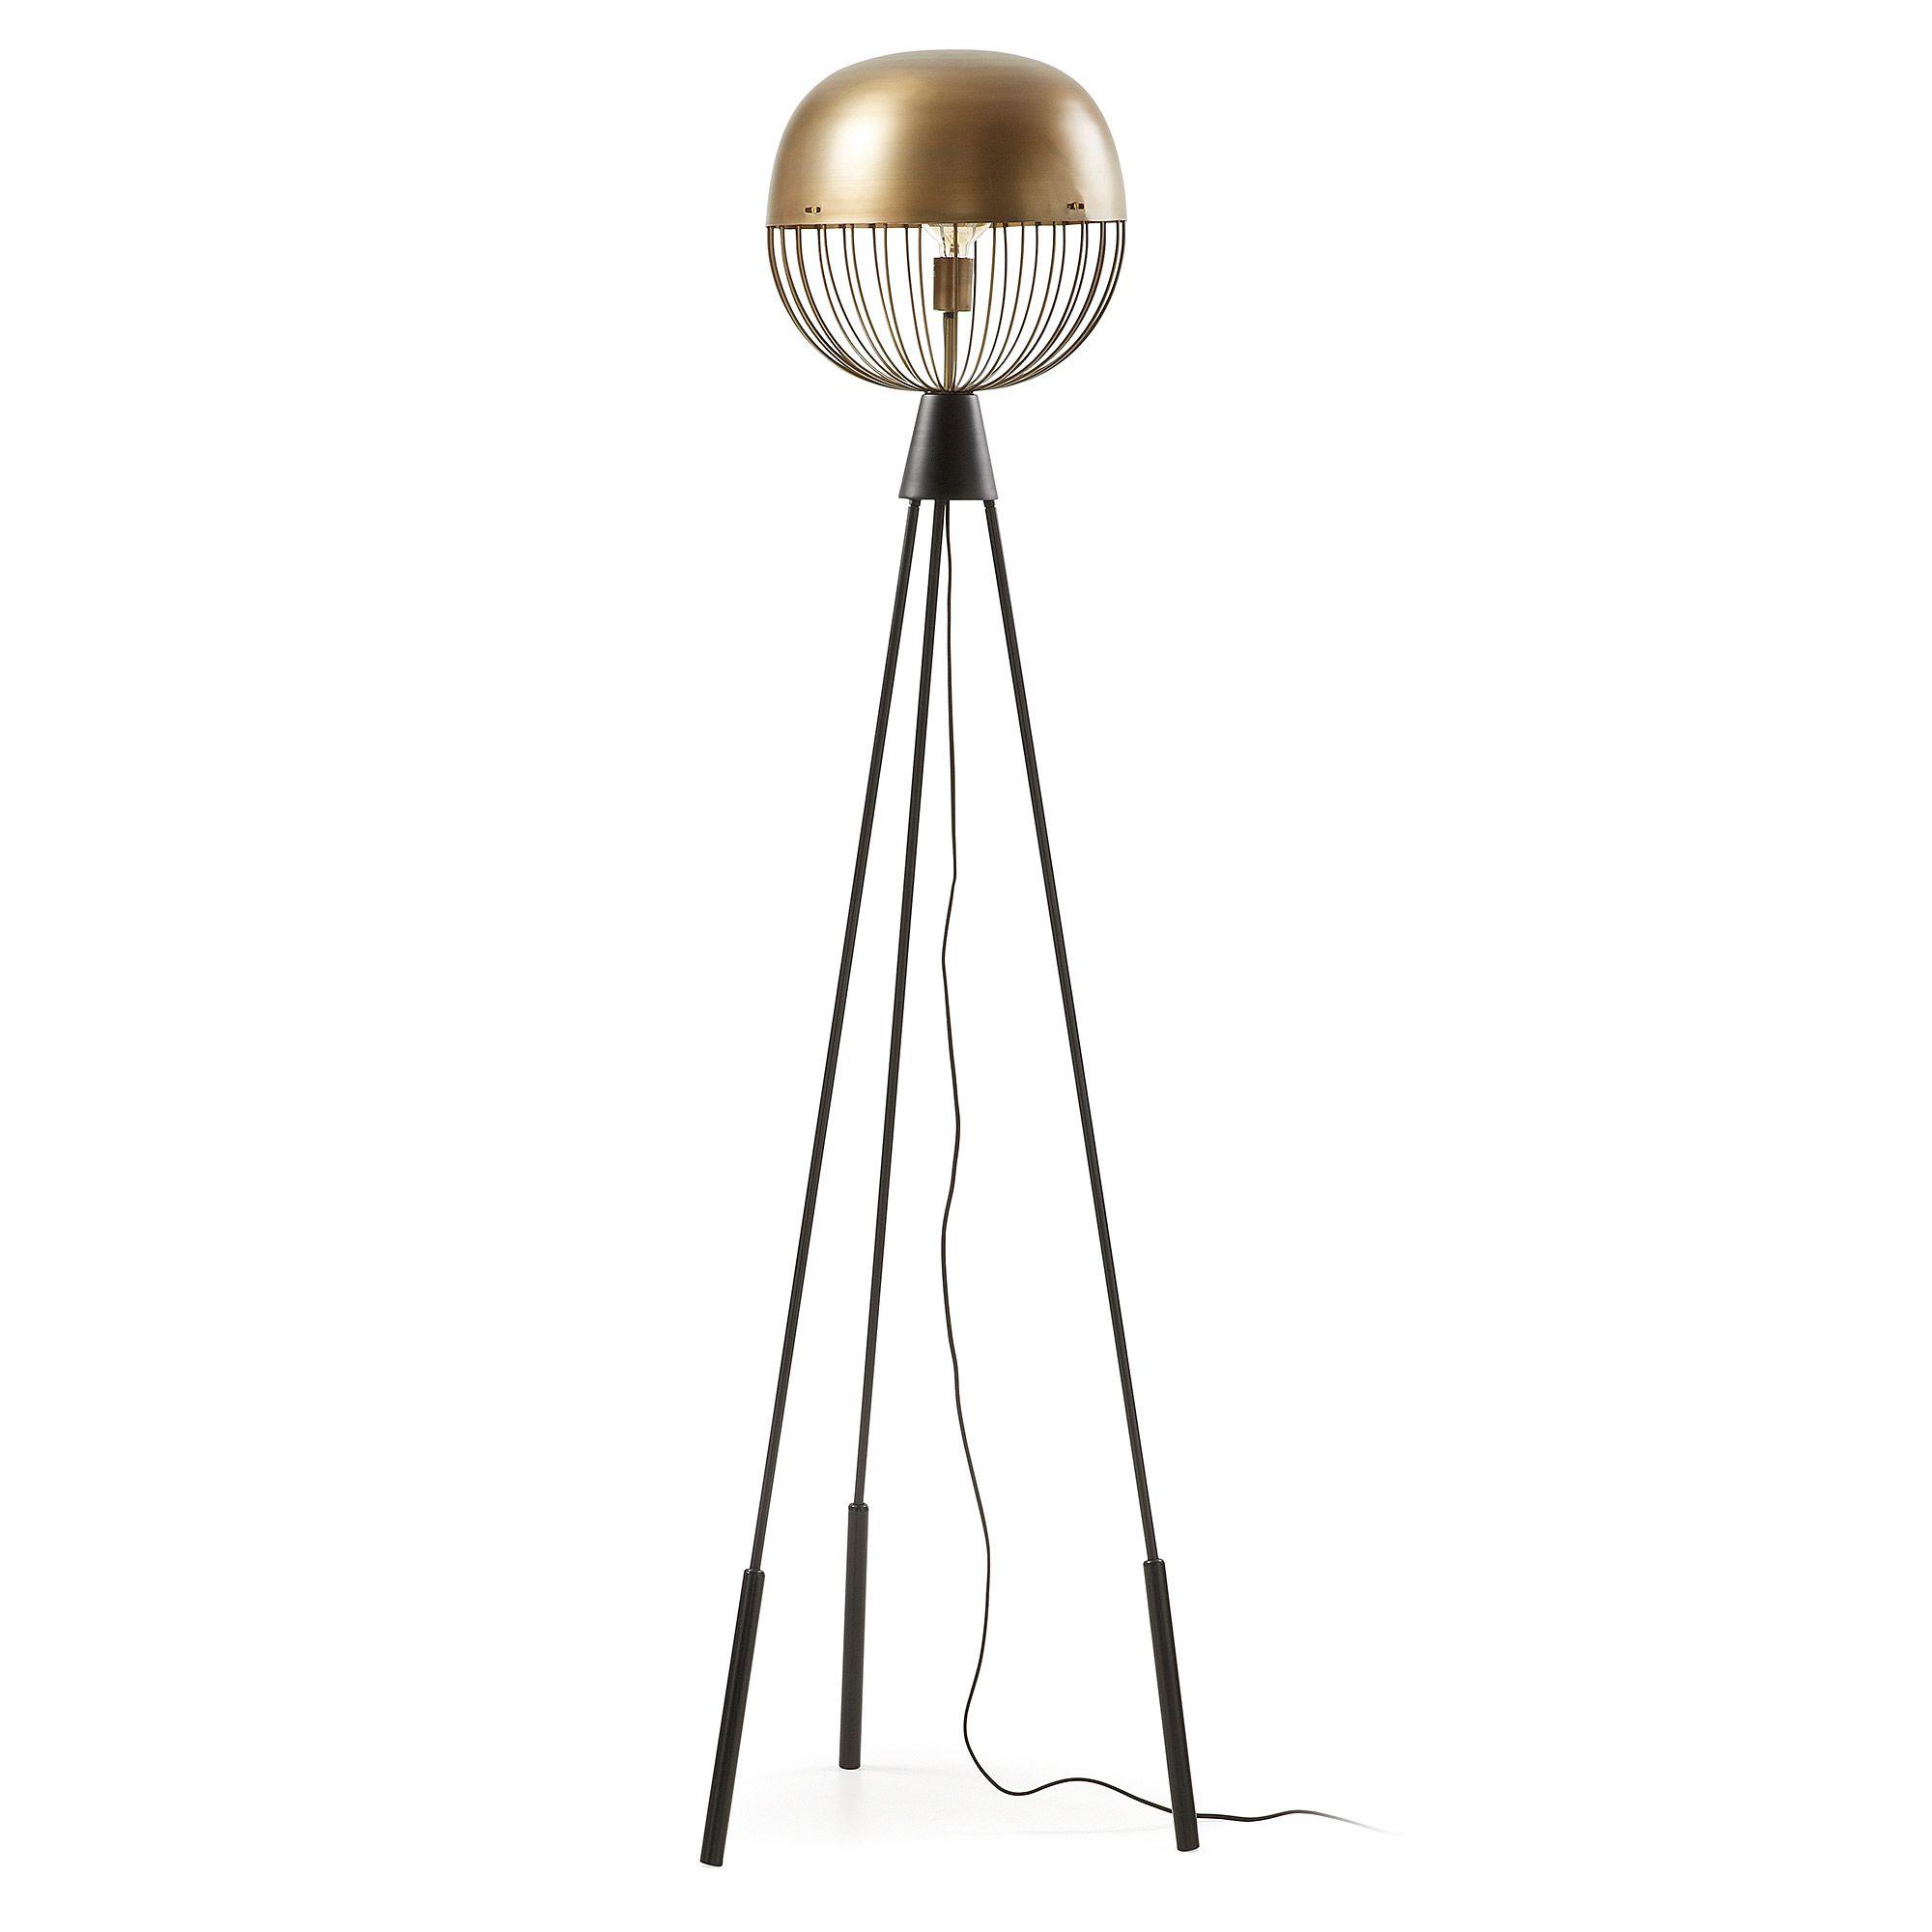 Lampadaire Brenda Kave Home Floor Lamp Lamp Kave Home